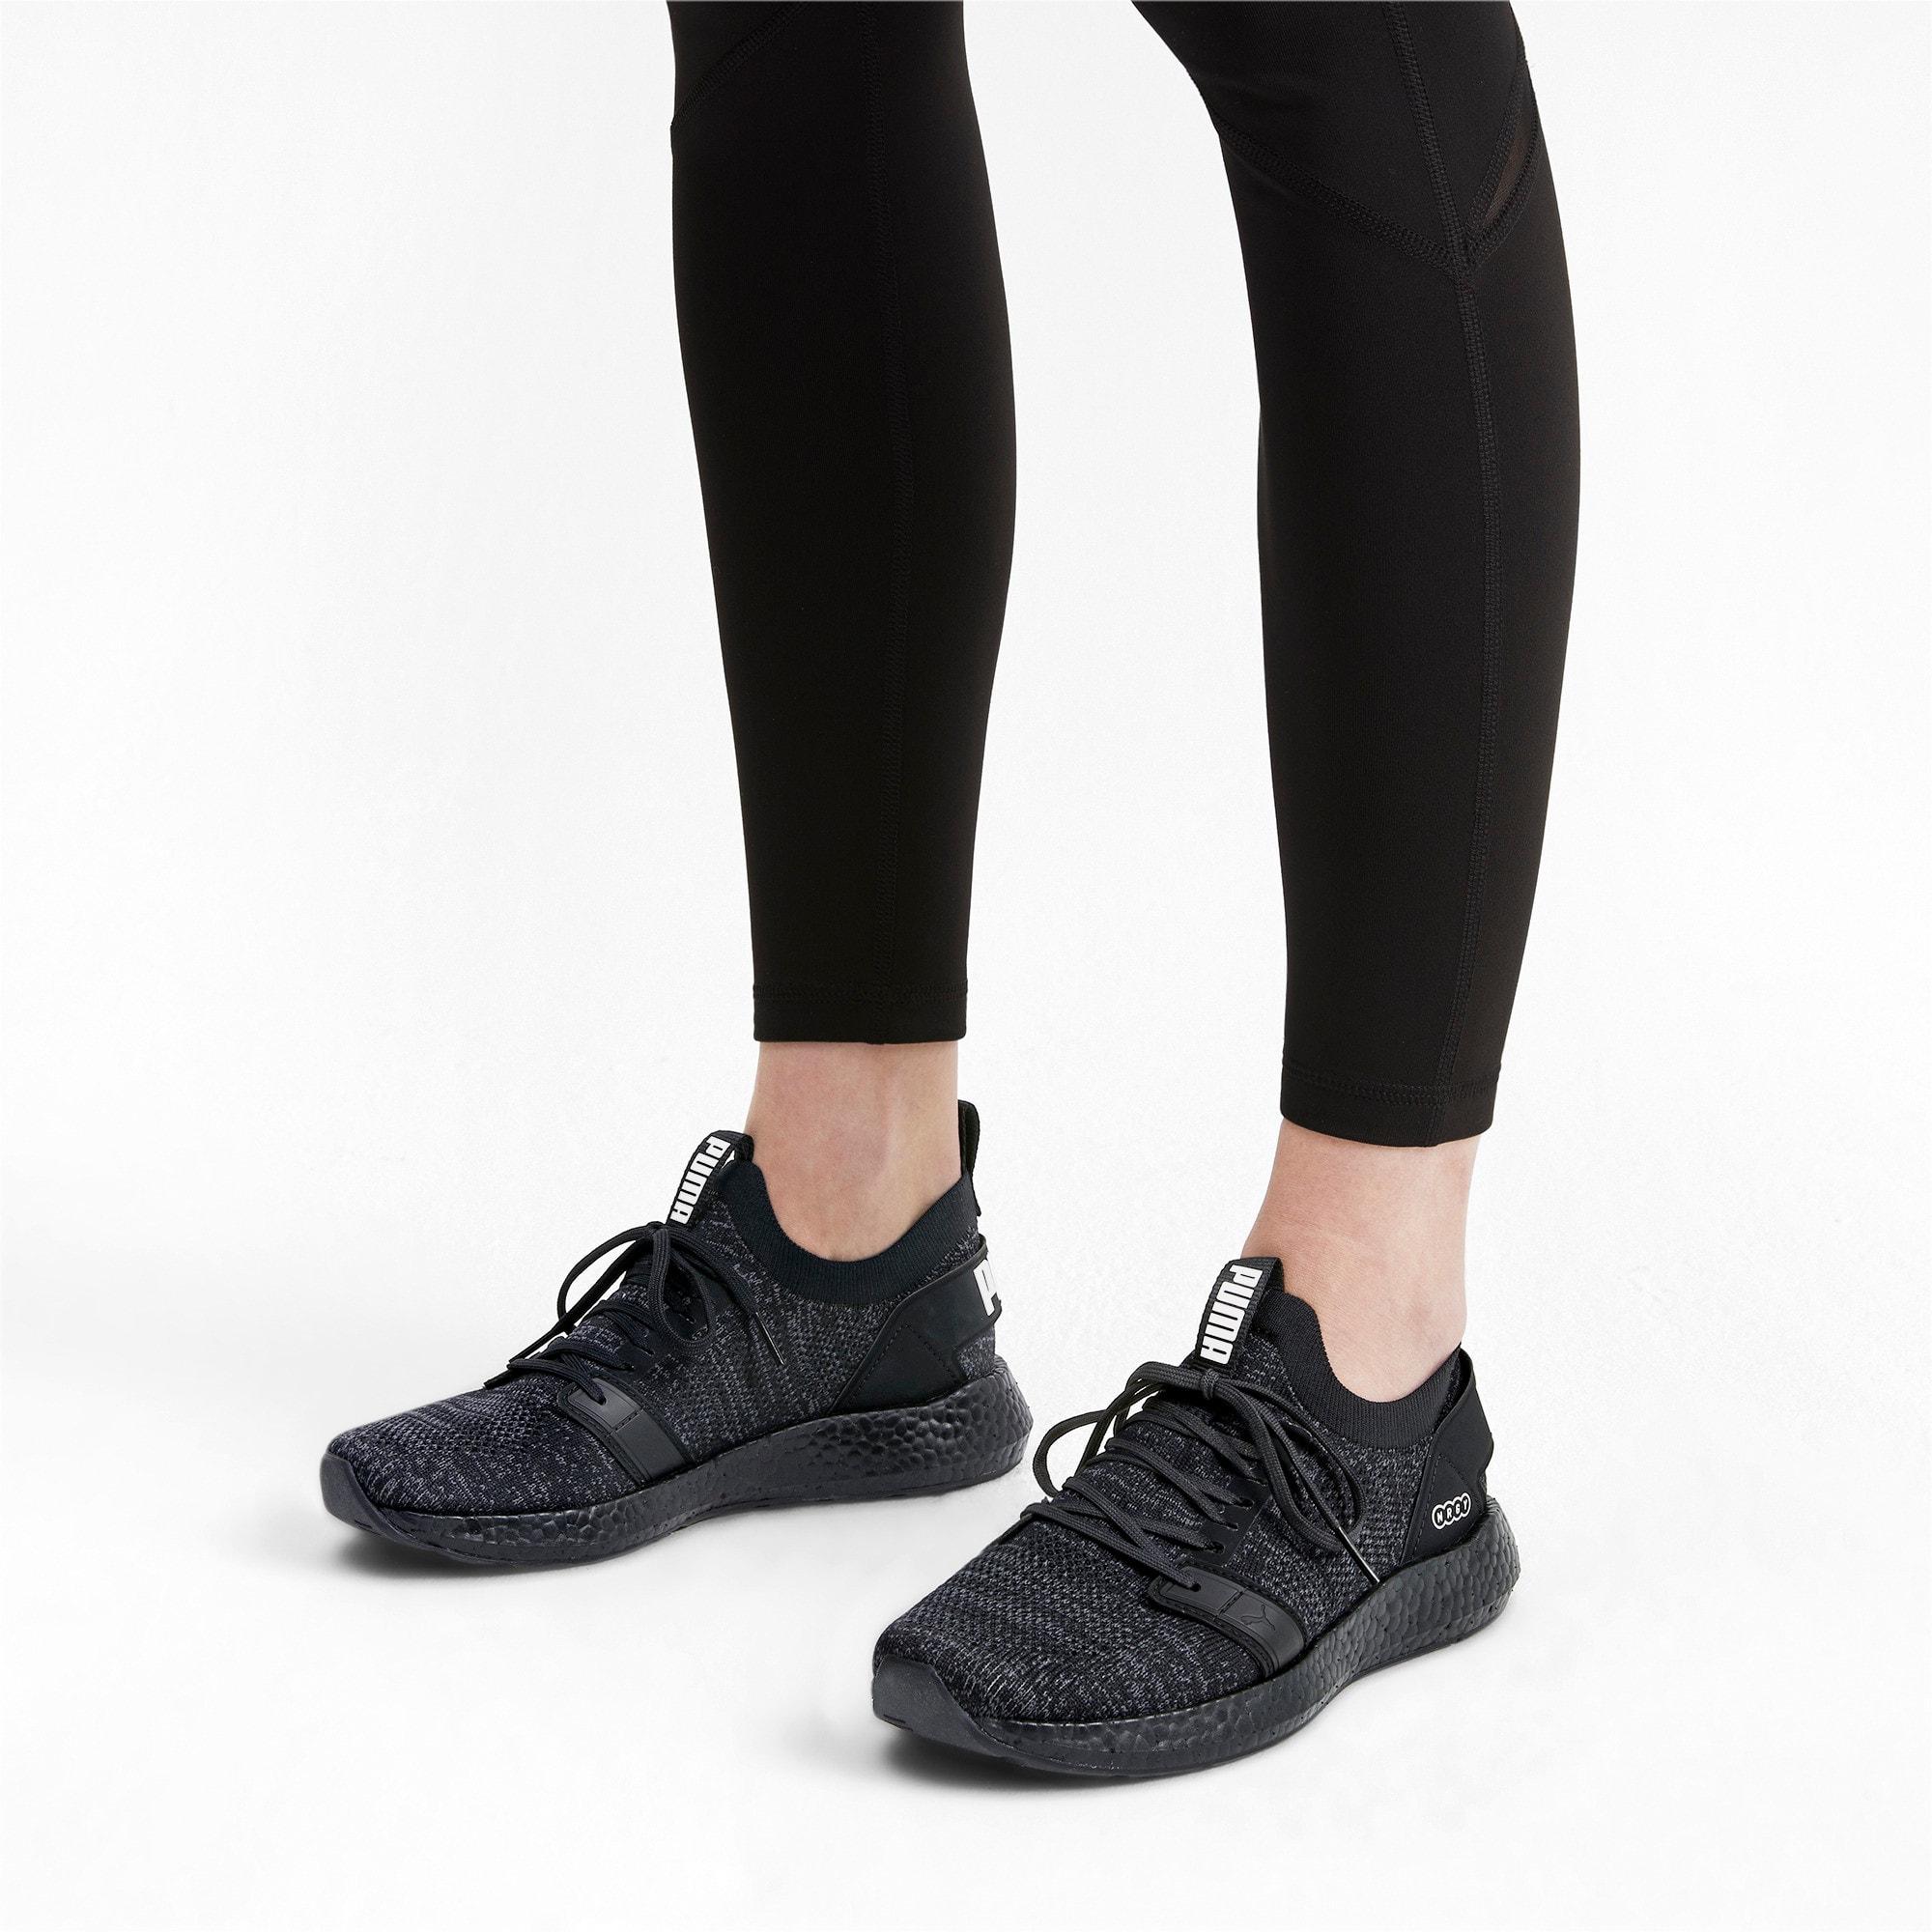 Thumbnail 3 of NRGY Neko Engineer Knit Women's Running Shoes, Puma Black-Puma Black, medium